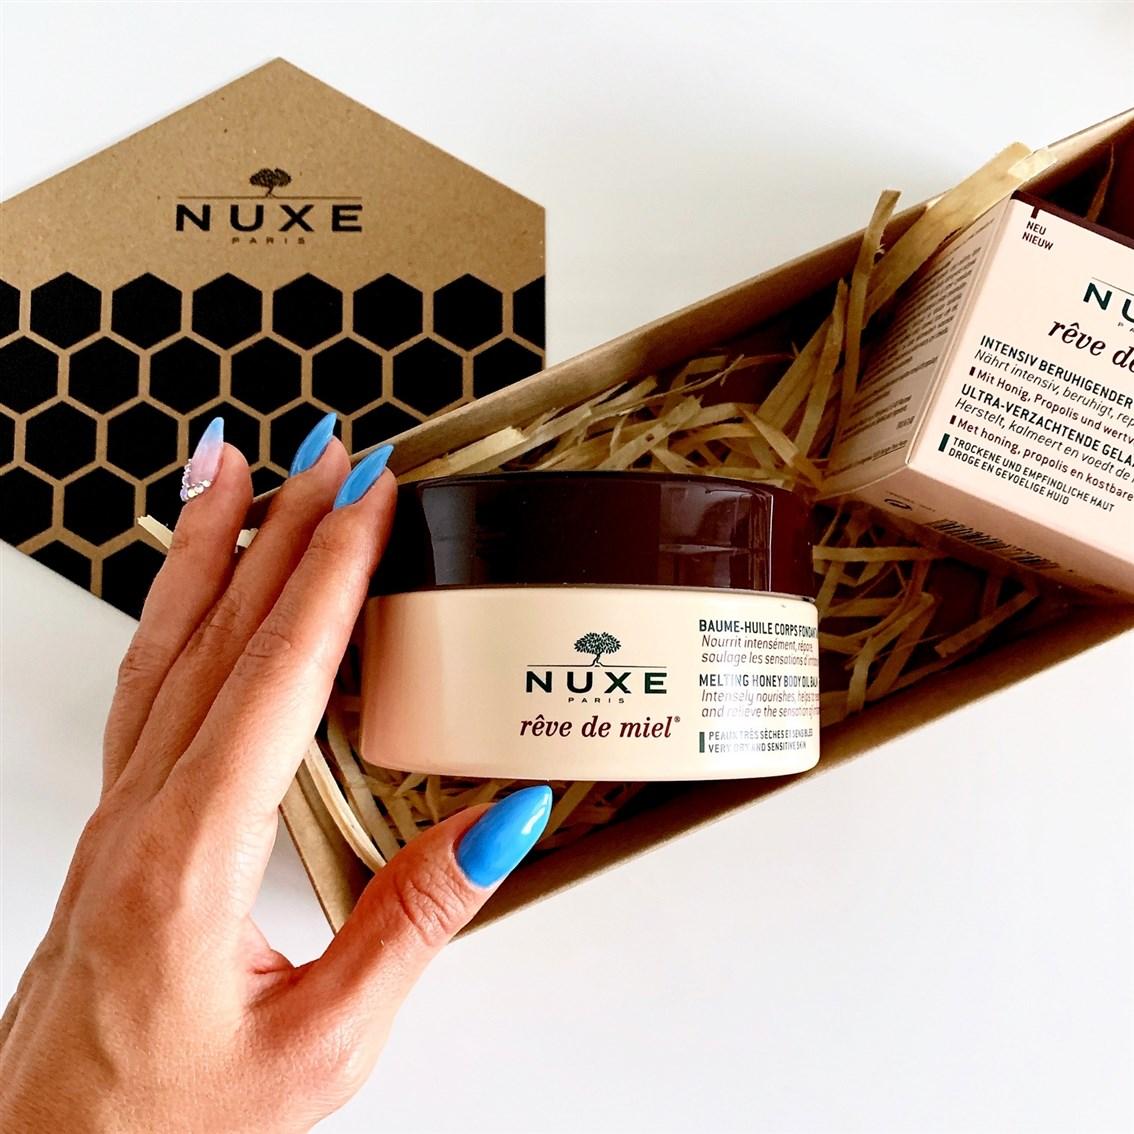 Nuxe Reve de Miel olejkowy balsam do ciała